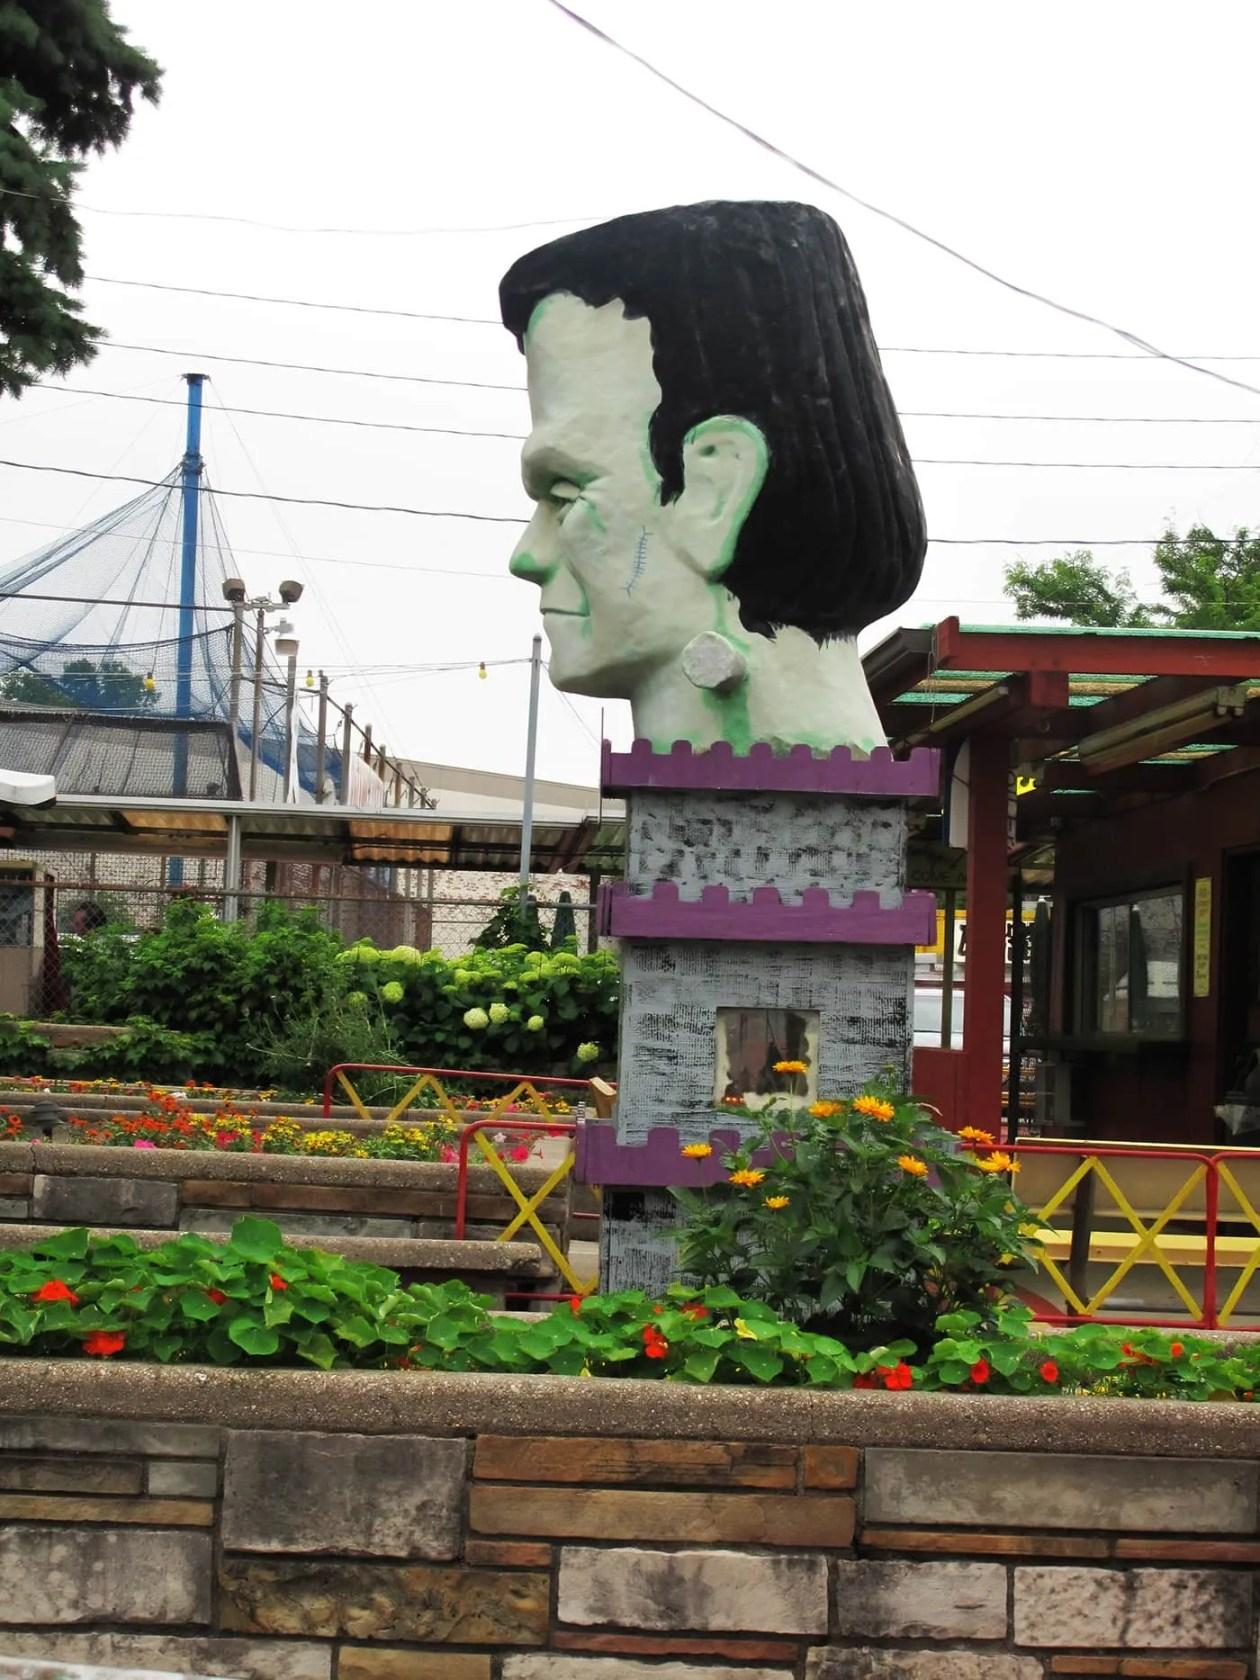 Frankenstein at Novelty Golf in Lincolnwood, Illinois.